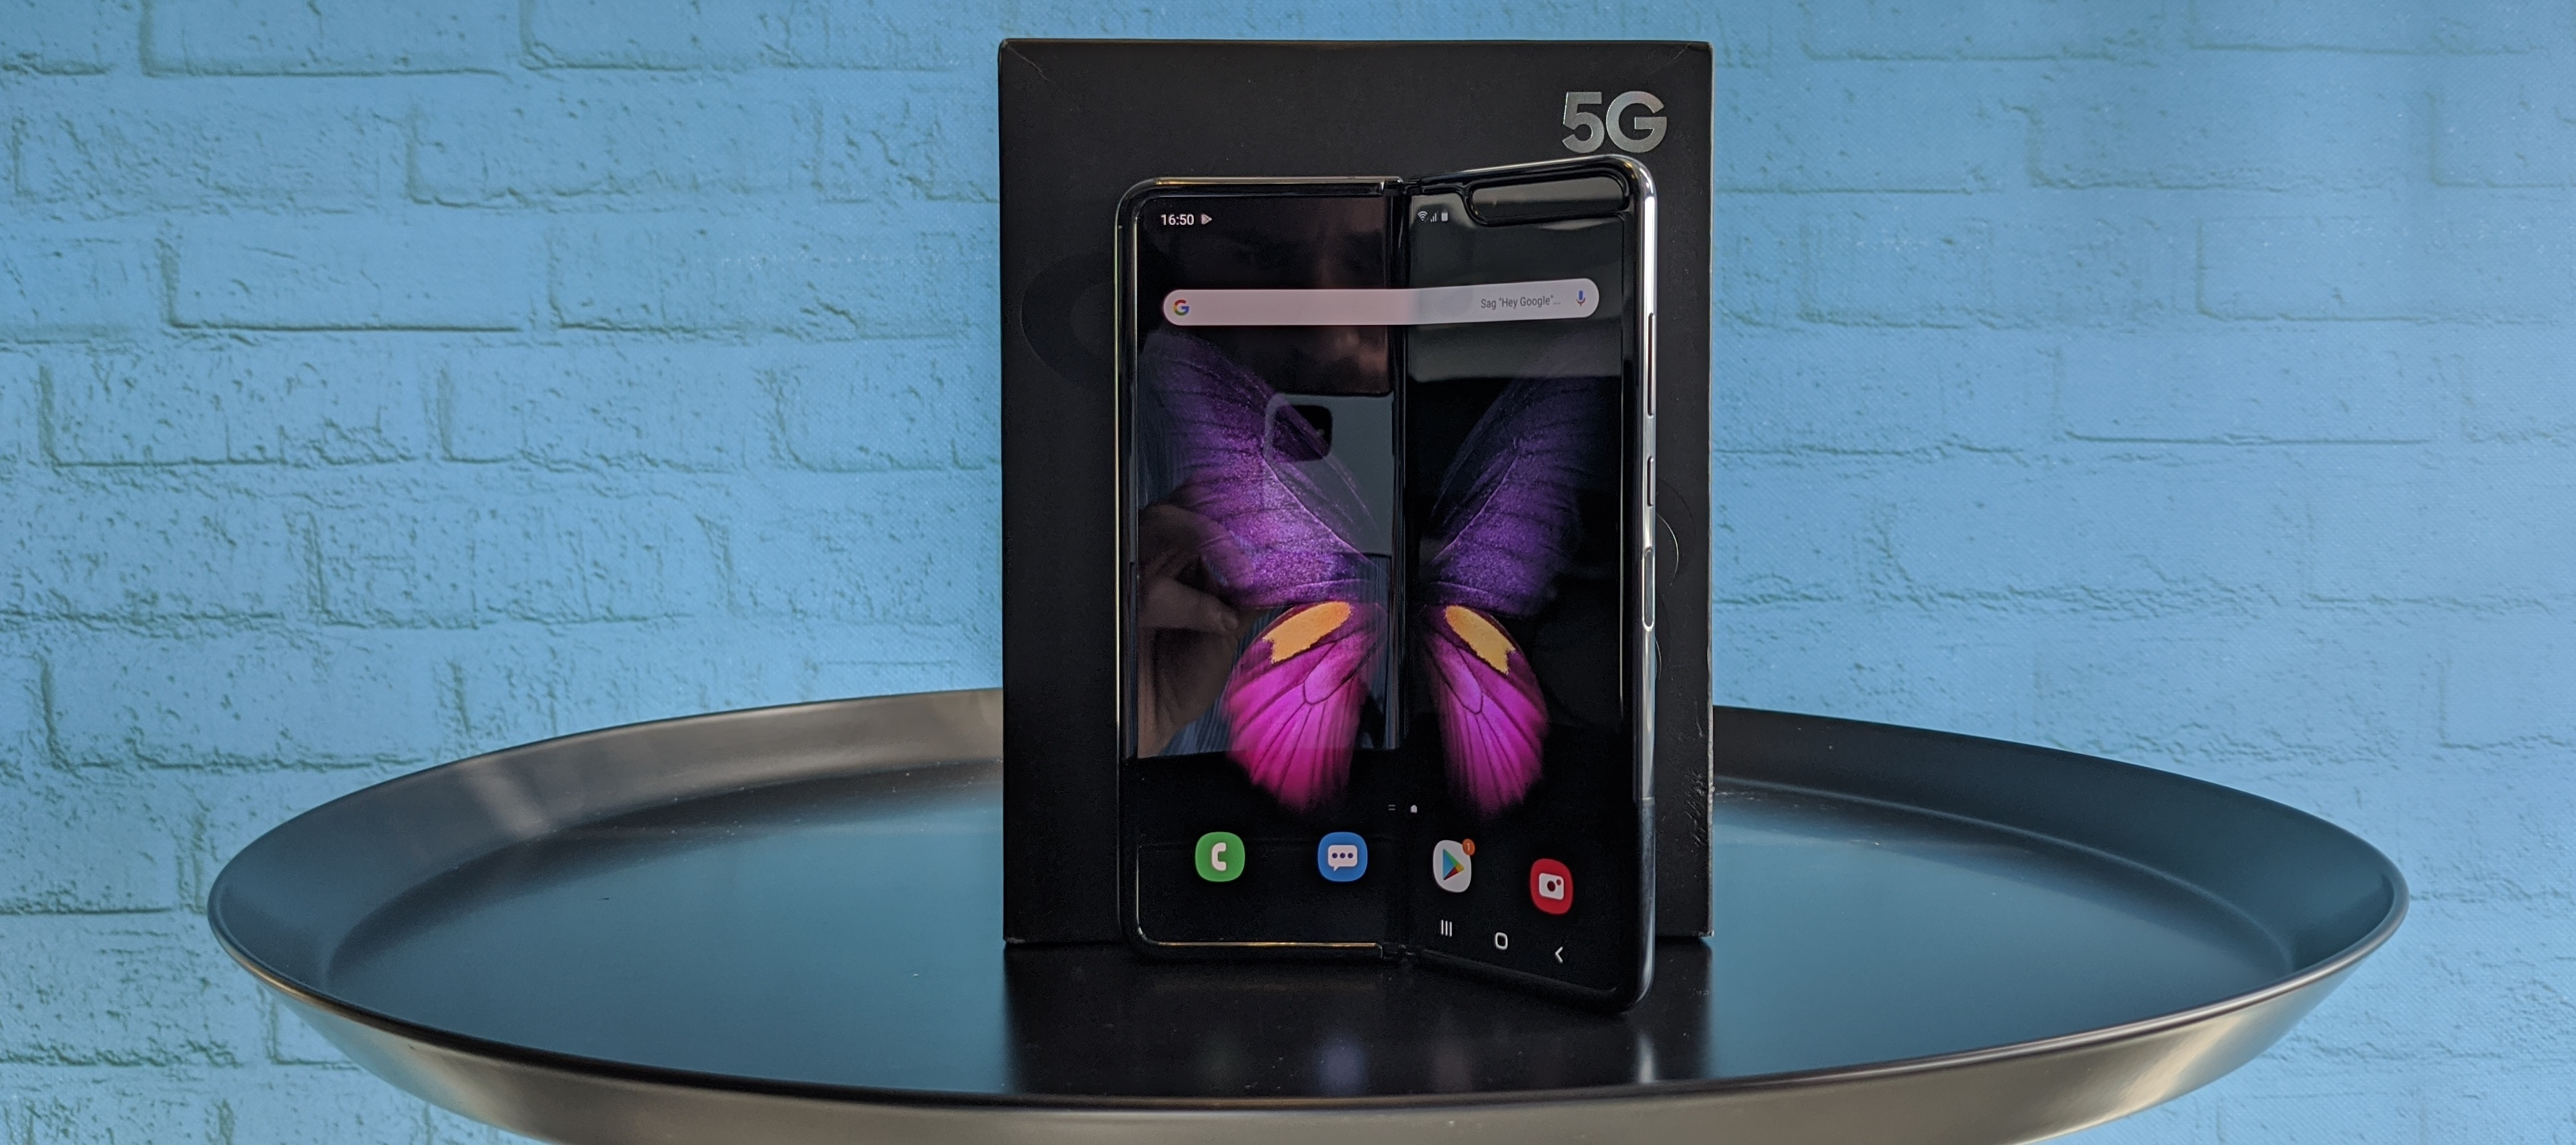 Samsung Galaxy Fold Testgerät: Klappen, falten, testen - jetzt bewerben!